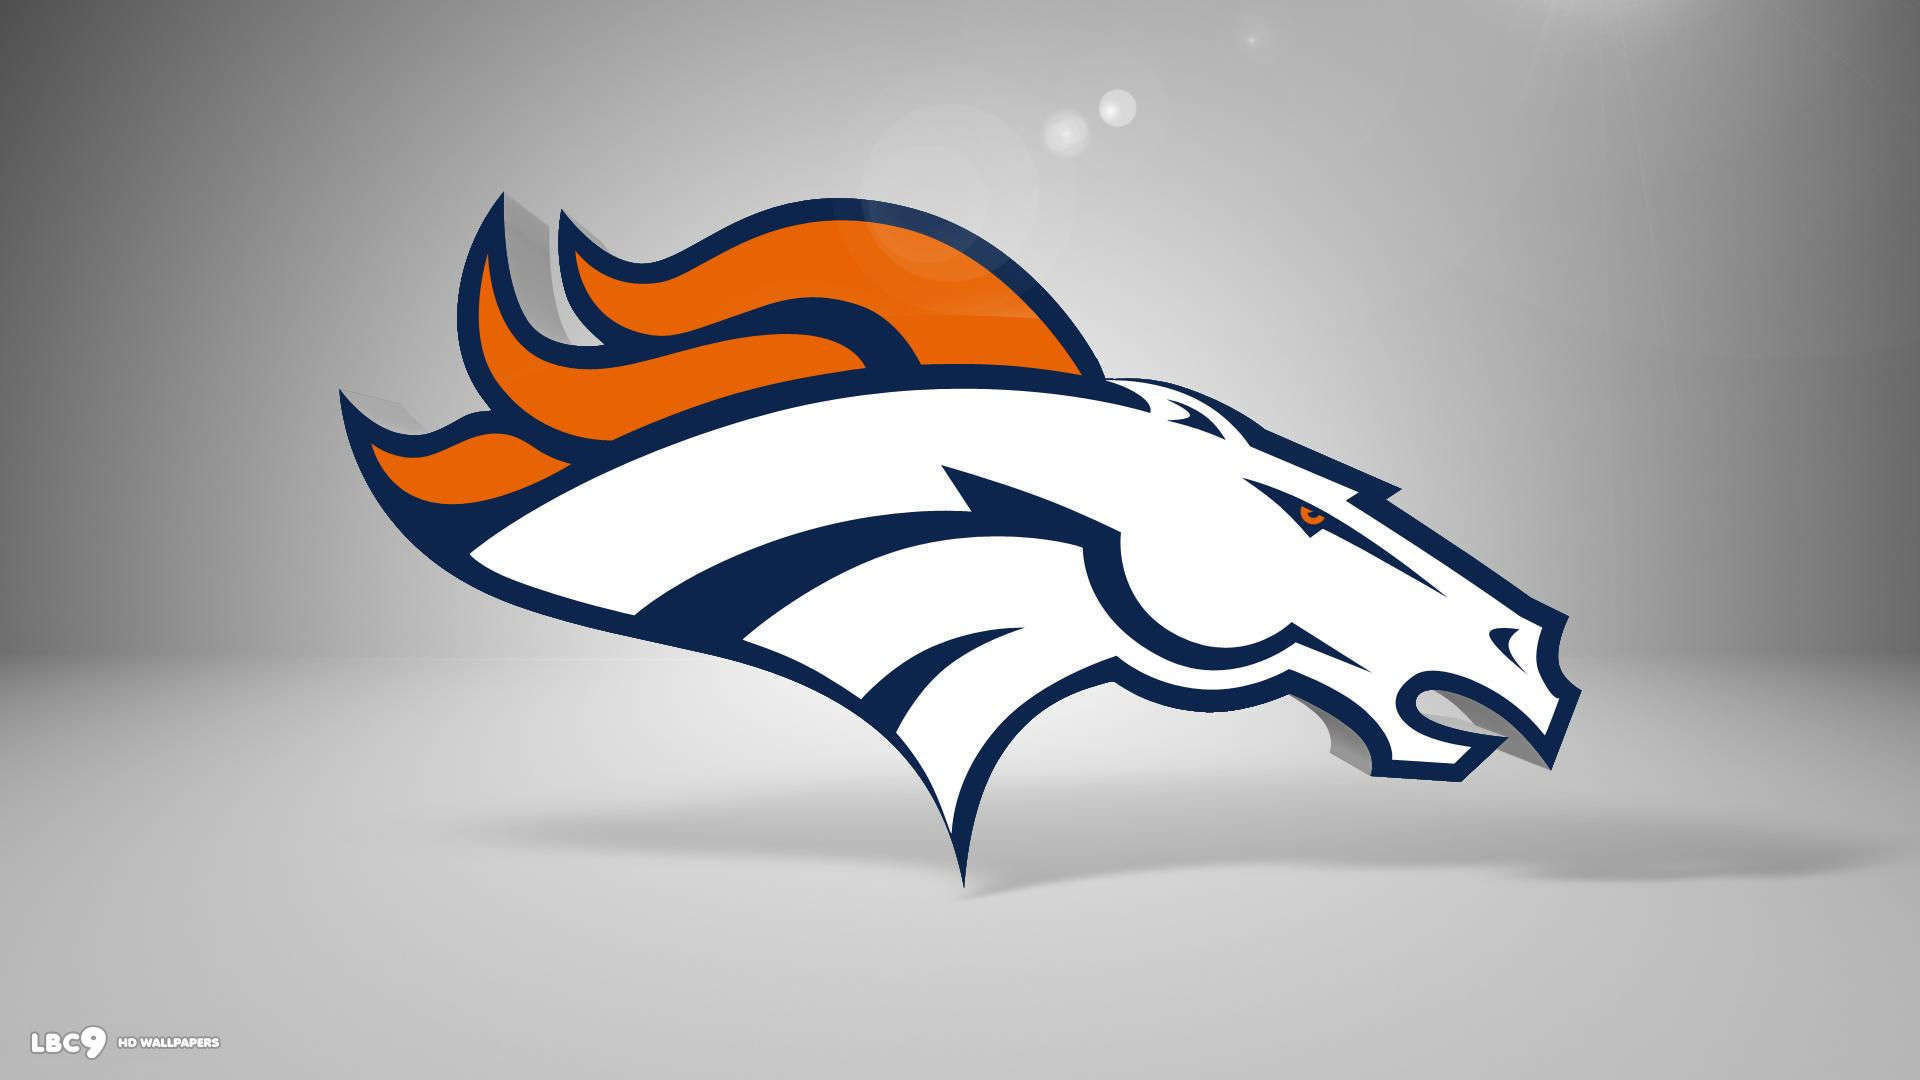 Res: 1920x1080, Denver Broncos Wallpapers 8 - 1920 X 1080